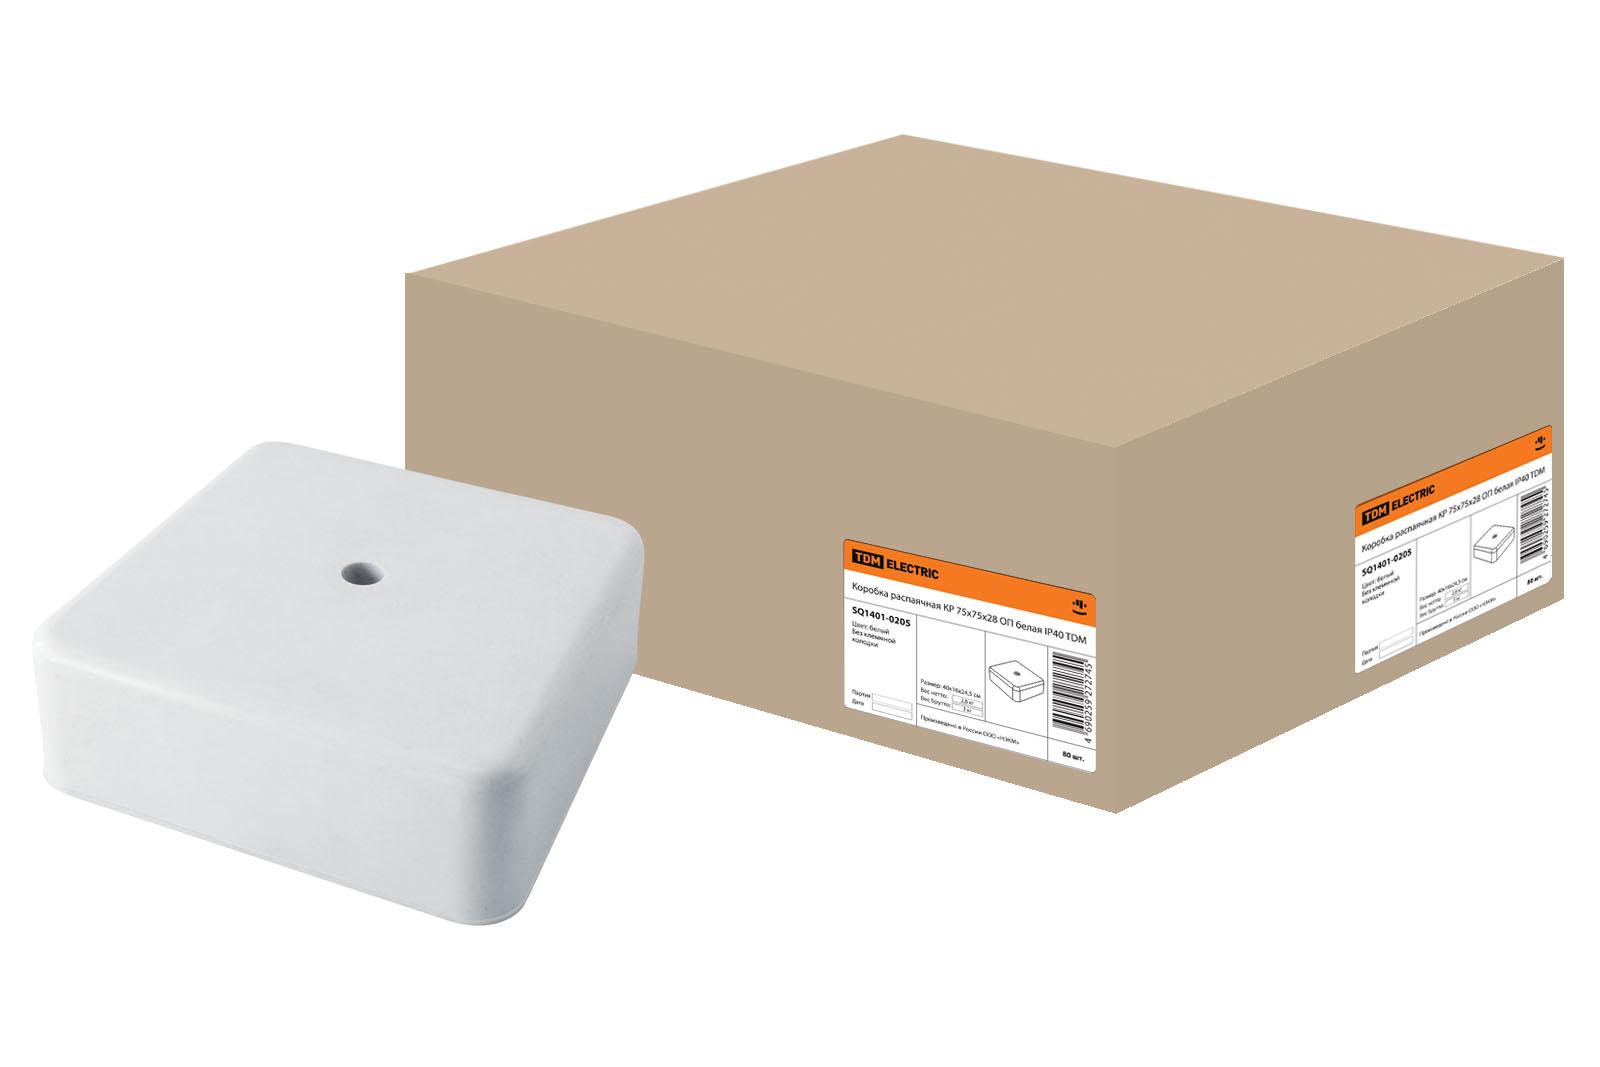 Коробка распаячная Tdm Sq1401-0205 коробка распаячная тдм sq1402 1008 120х92х45мм крышка ip20